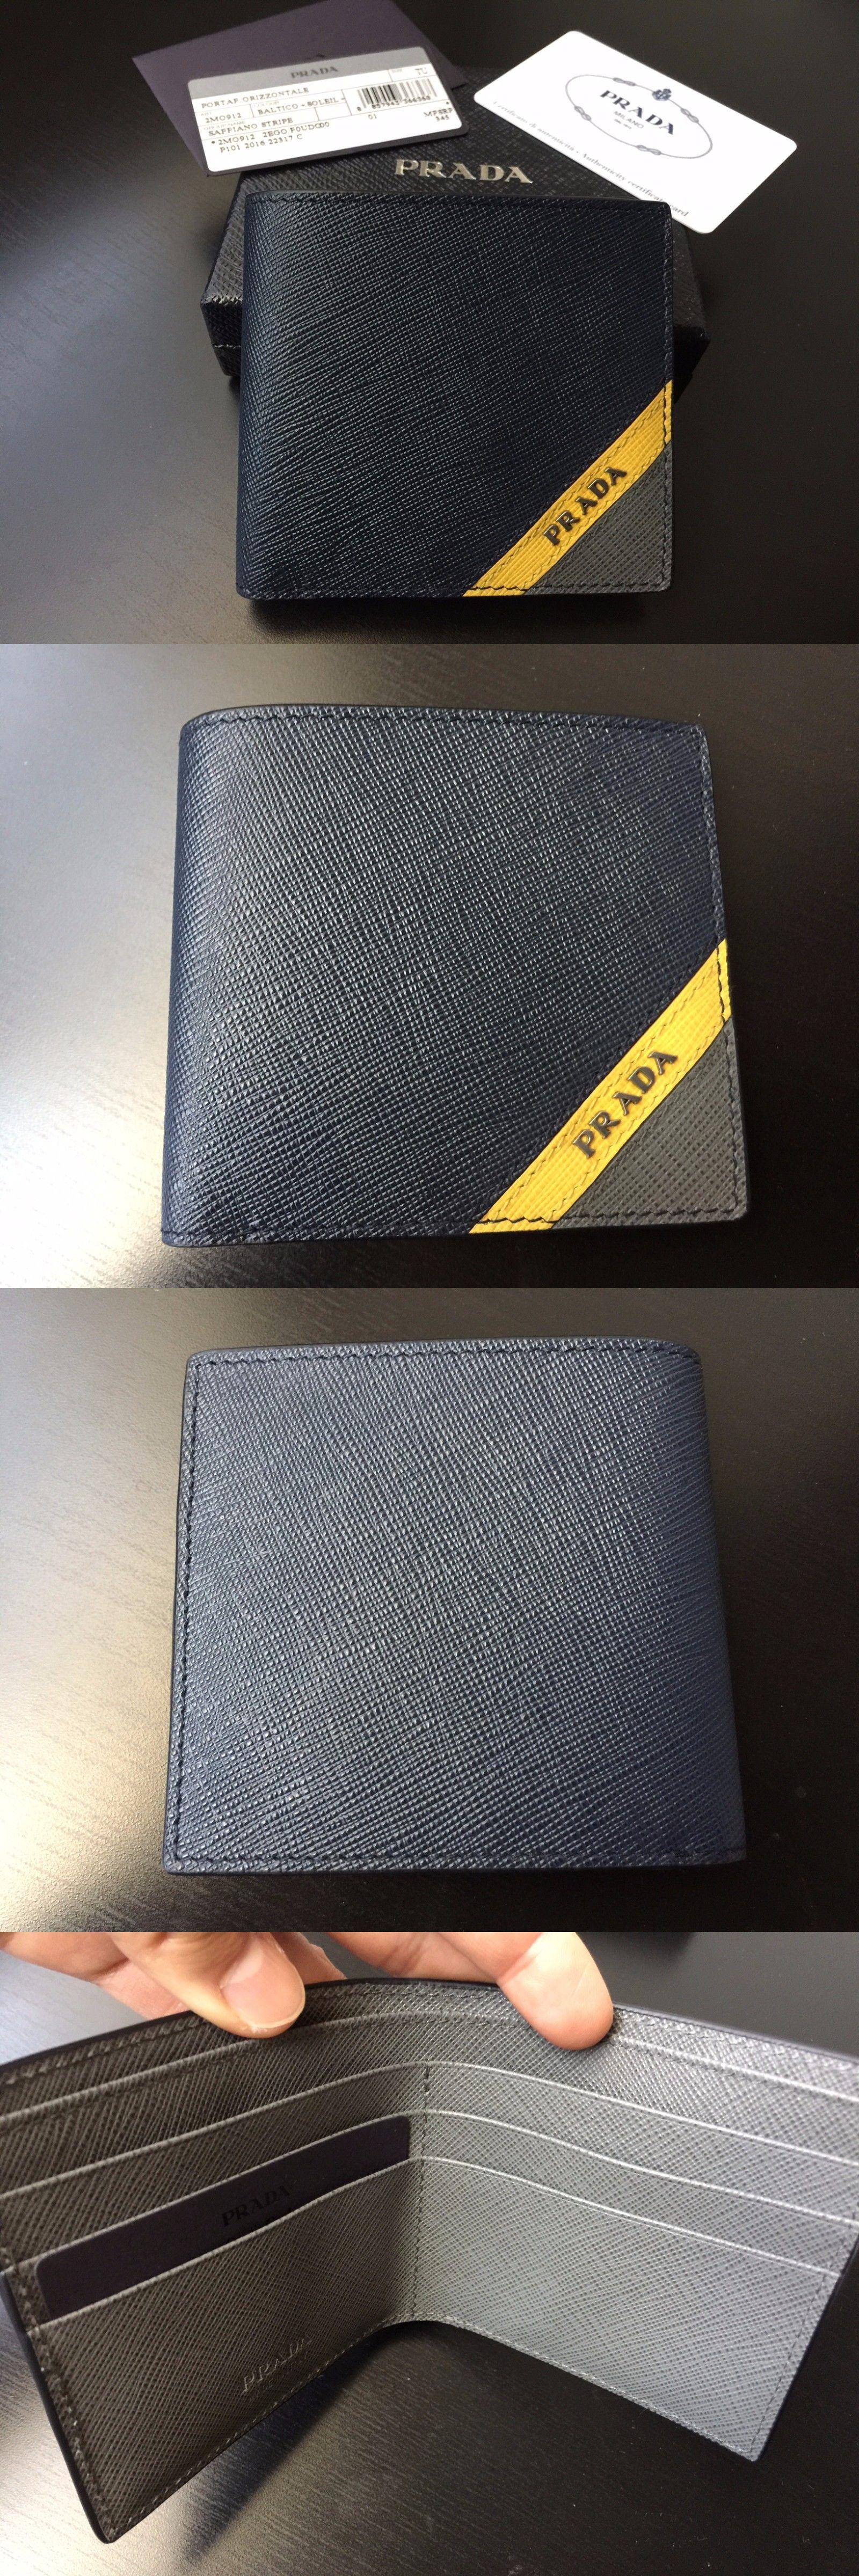 3dc7e09fa933a0 ... order wallets 2996 new prada men s wallet saffiano tricolor stripe navy  yellow gray bifold bi